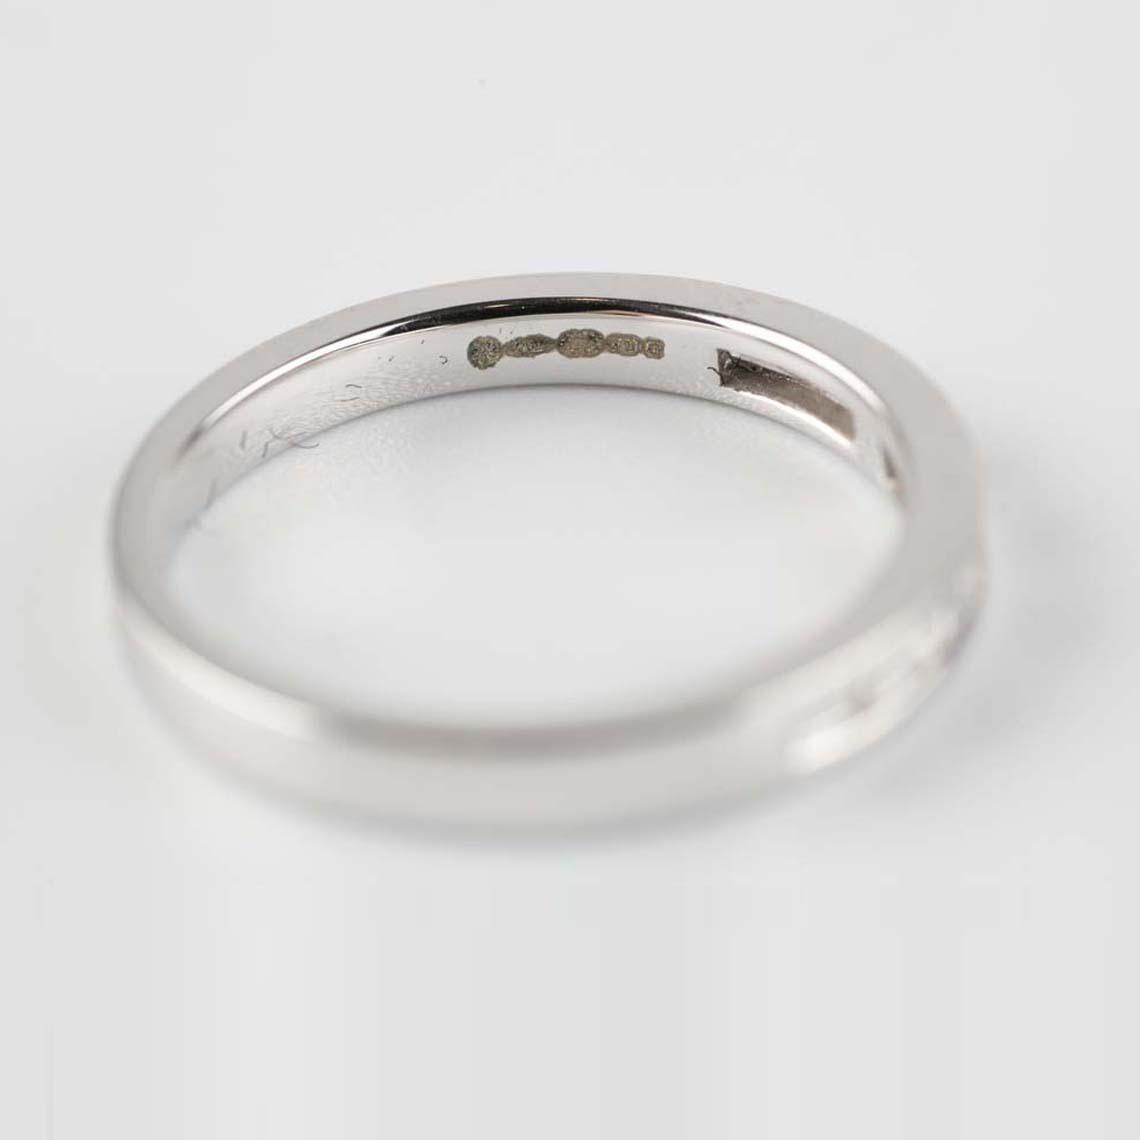 Eternity/wedding ring